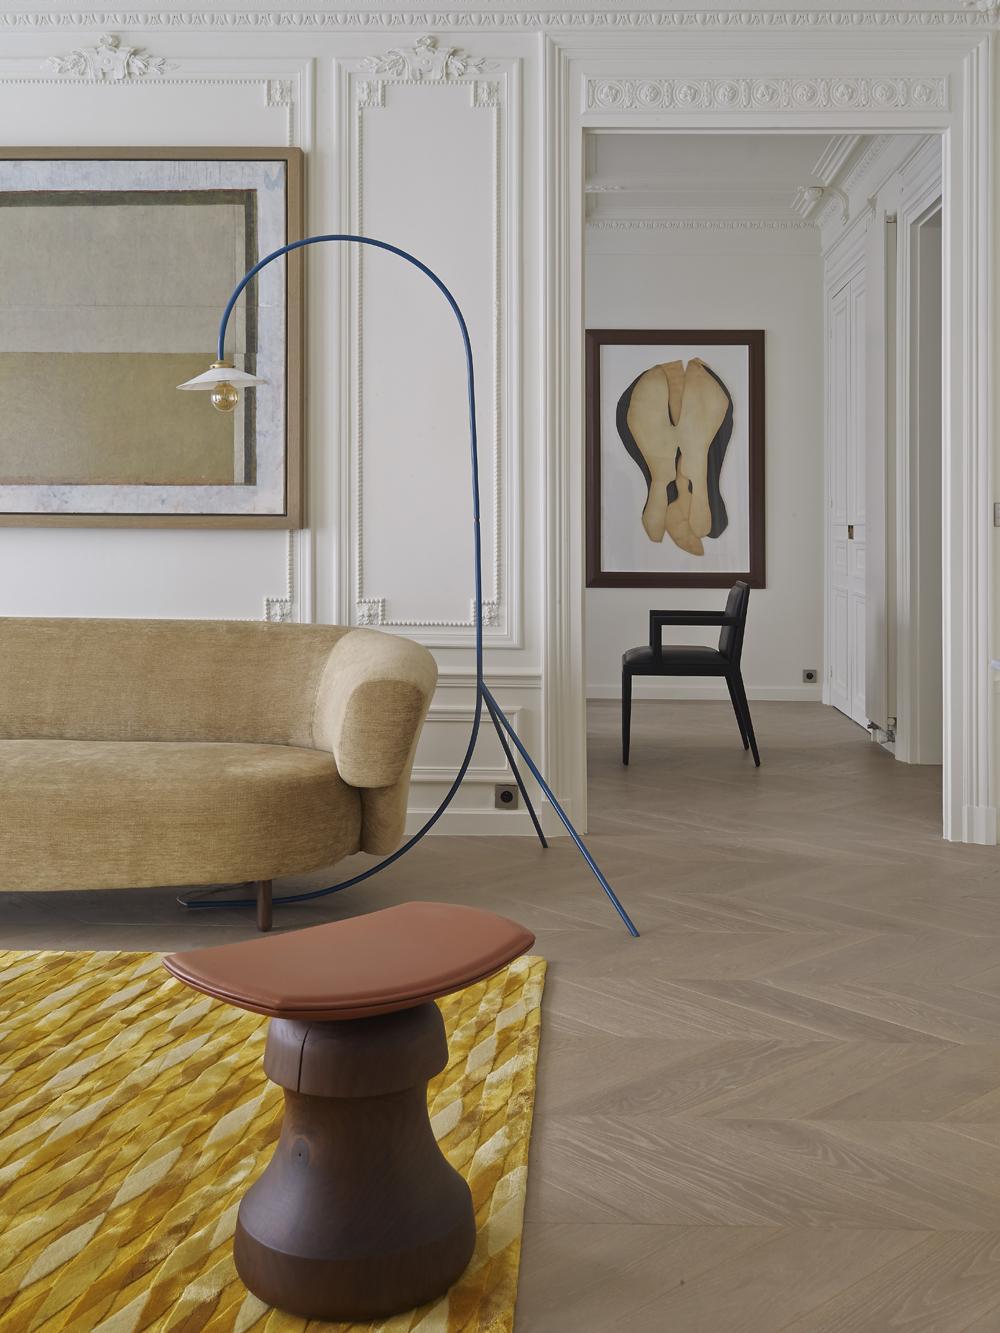 christophe-delcourt-interior-inspiration-.jpg